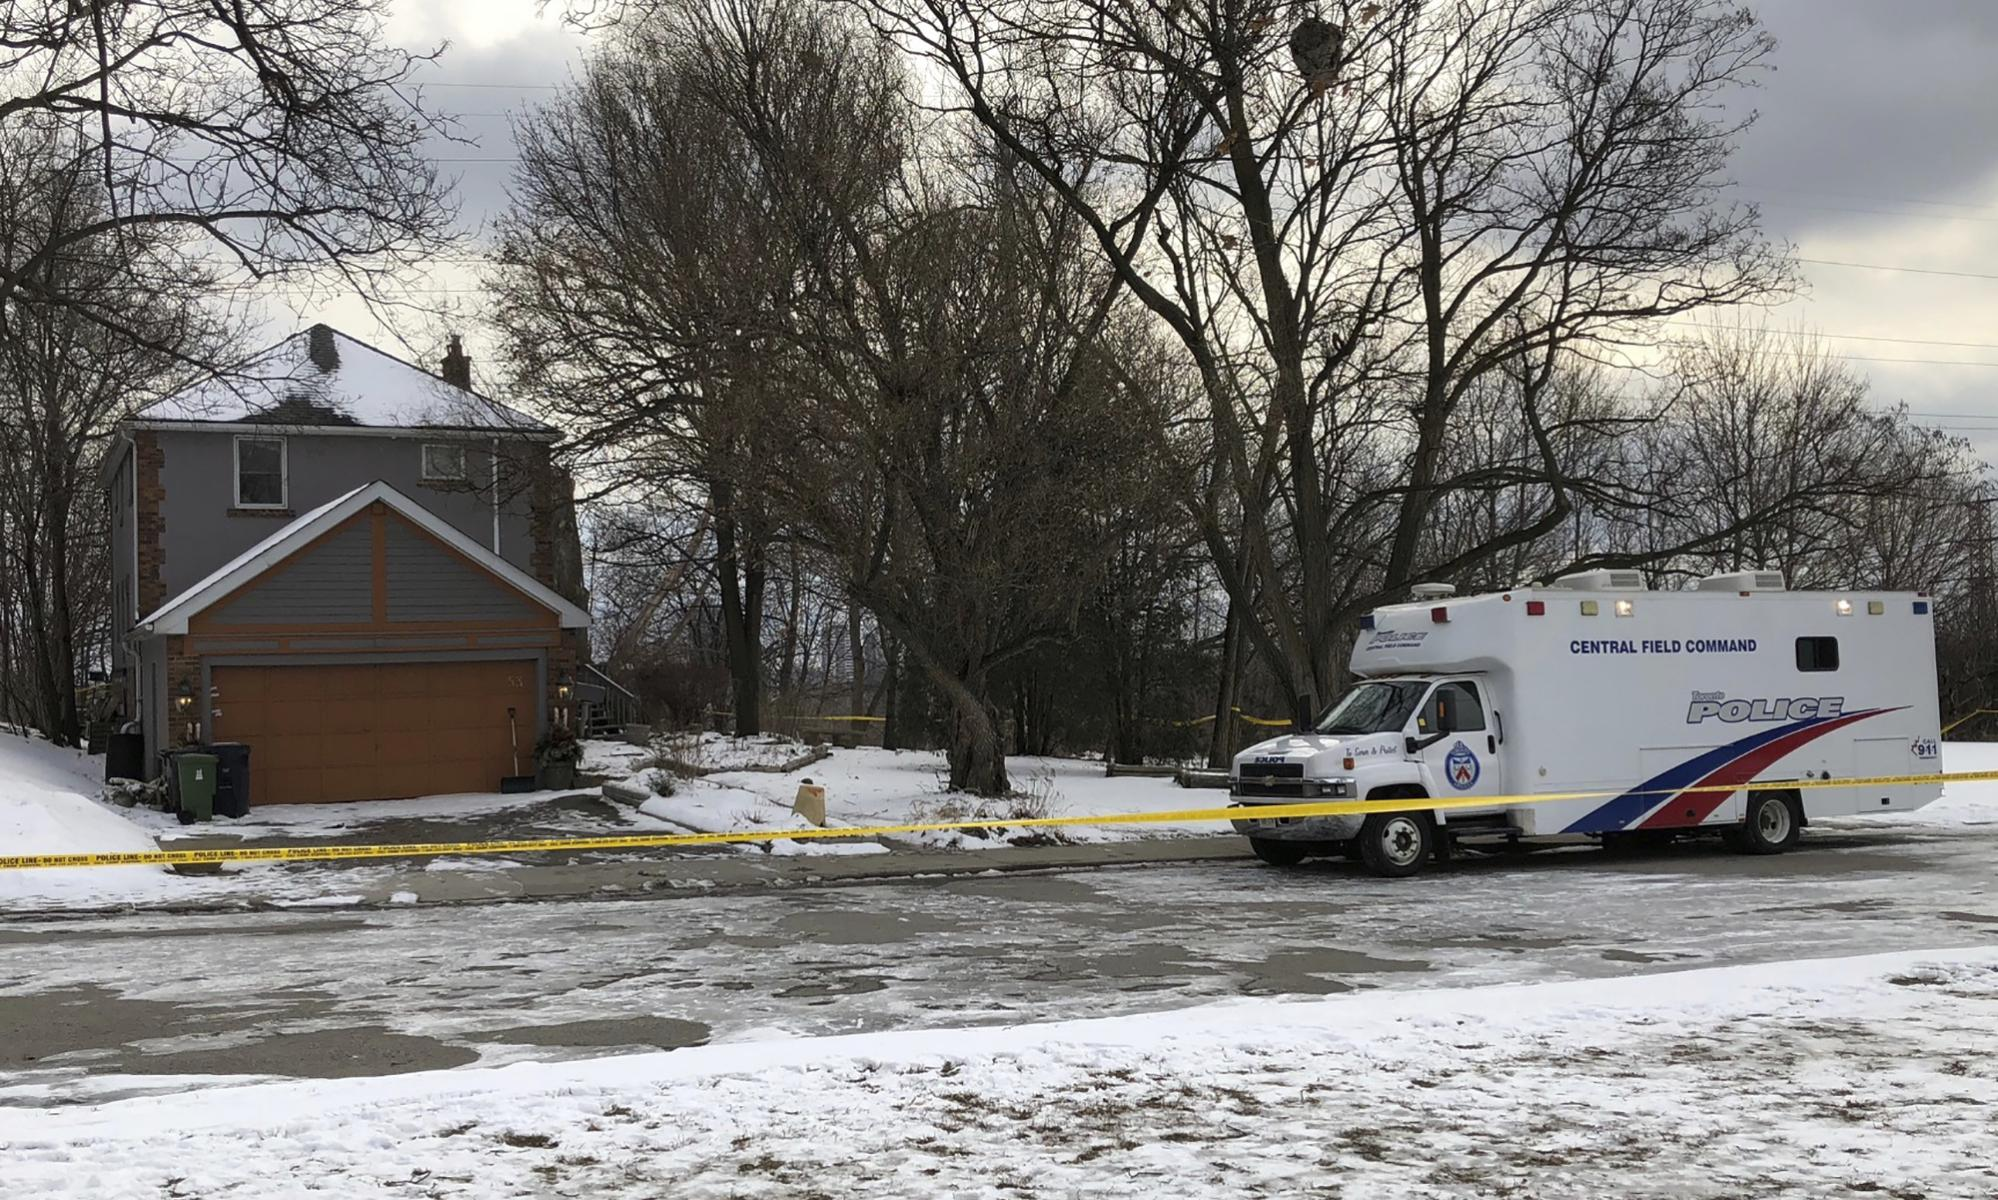 How alleged Toronto serial killer Bruce McArthur went unnoticed